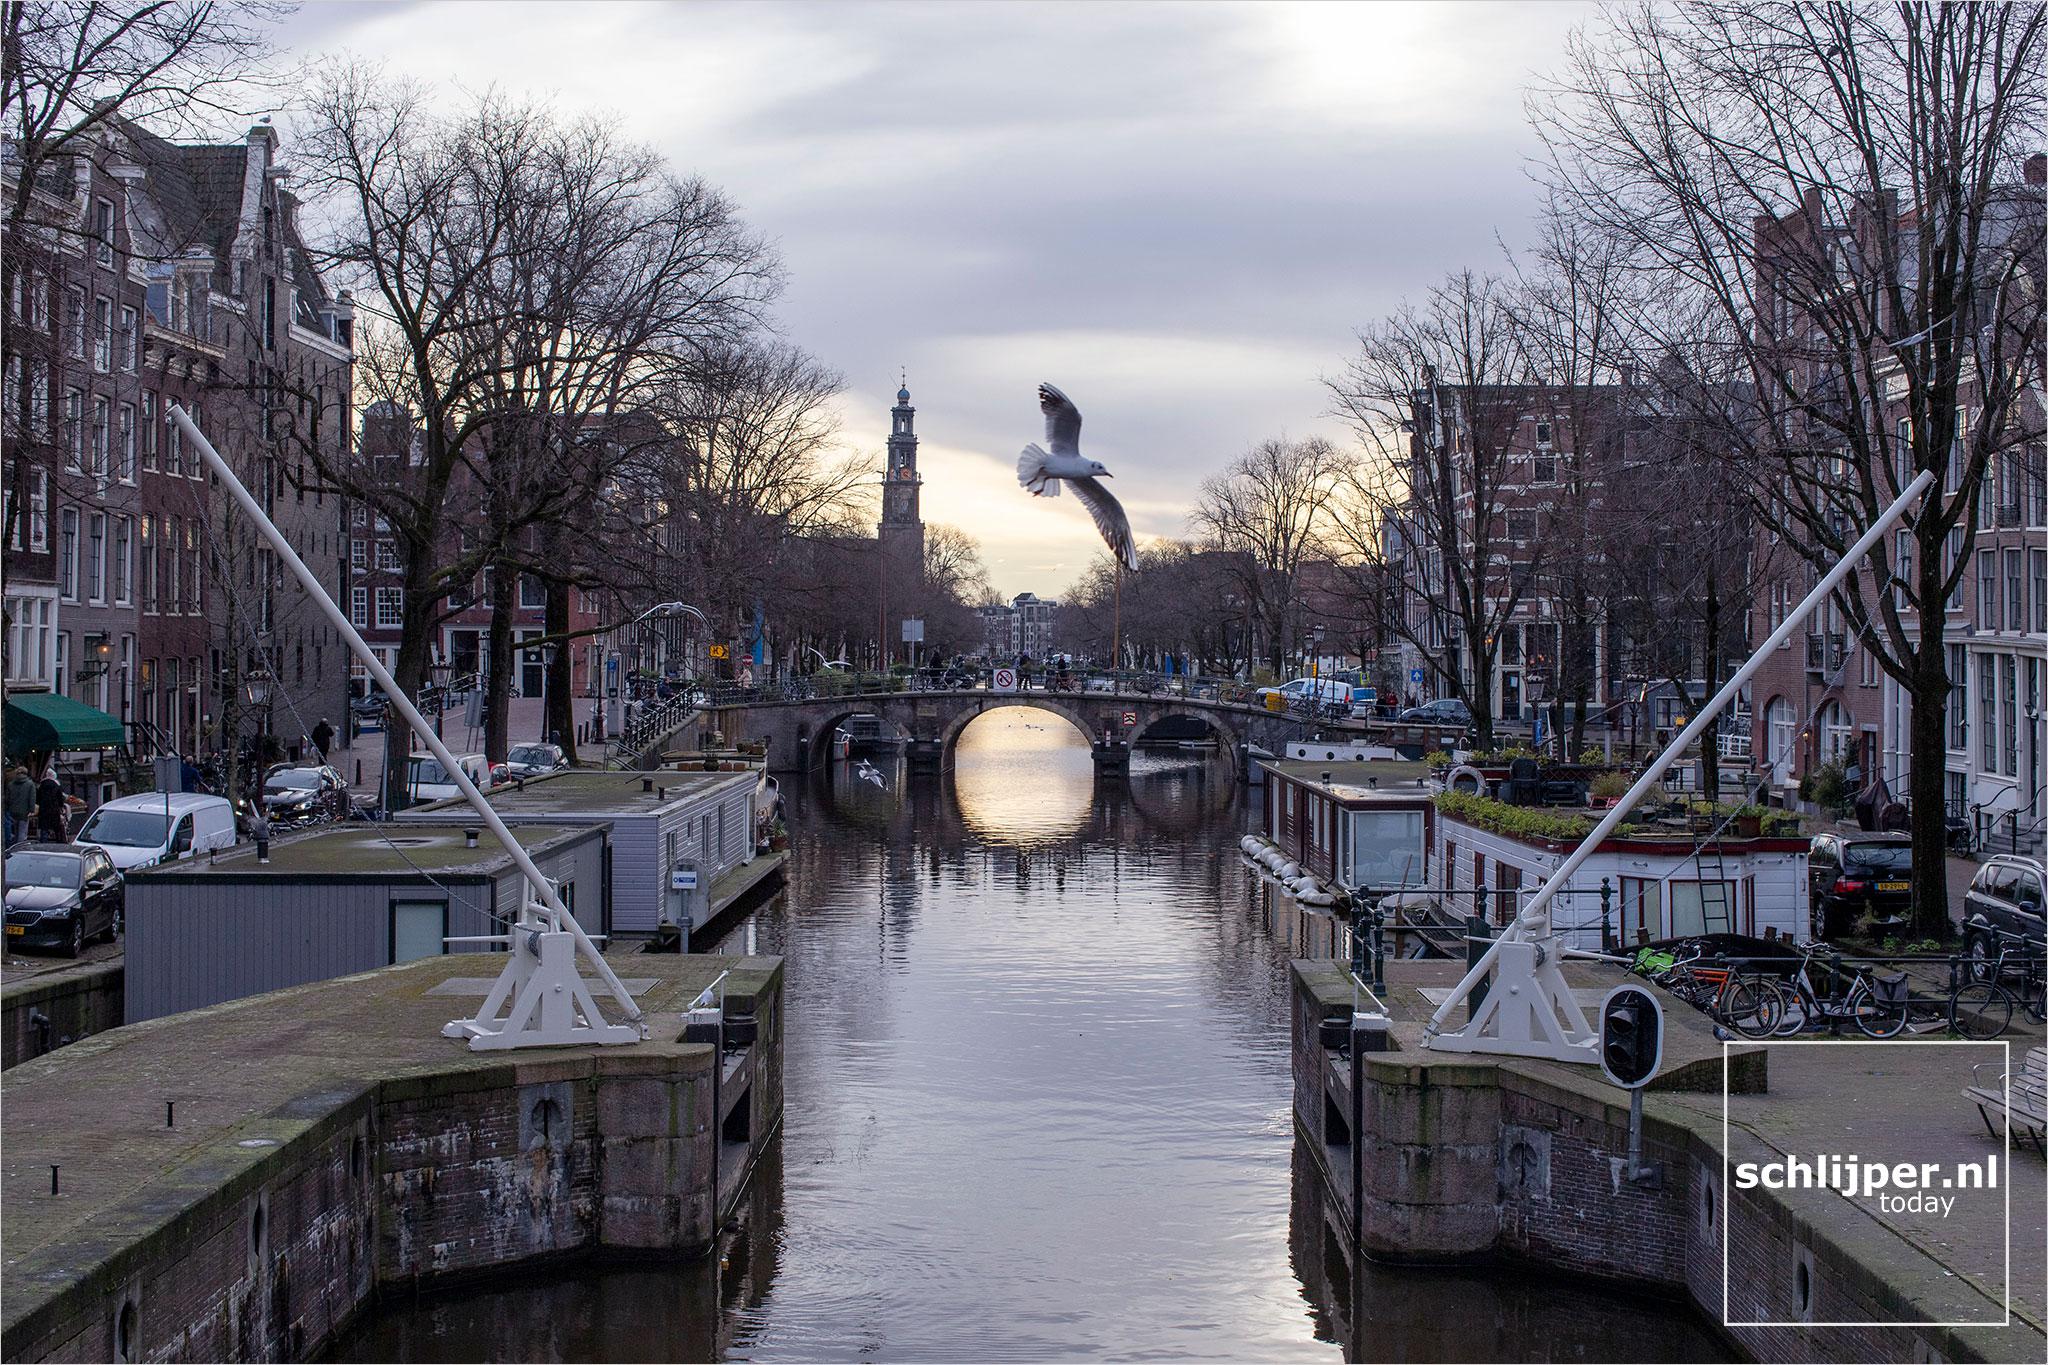 The Netherlands, Amsterdam, 26 januari 2021